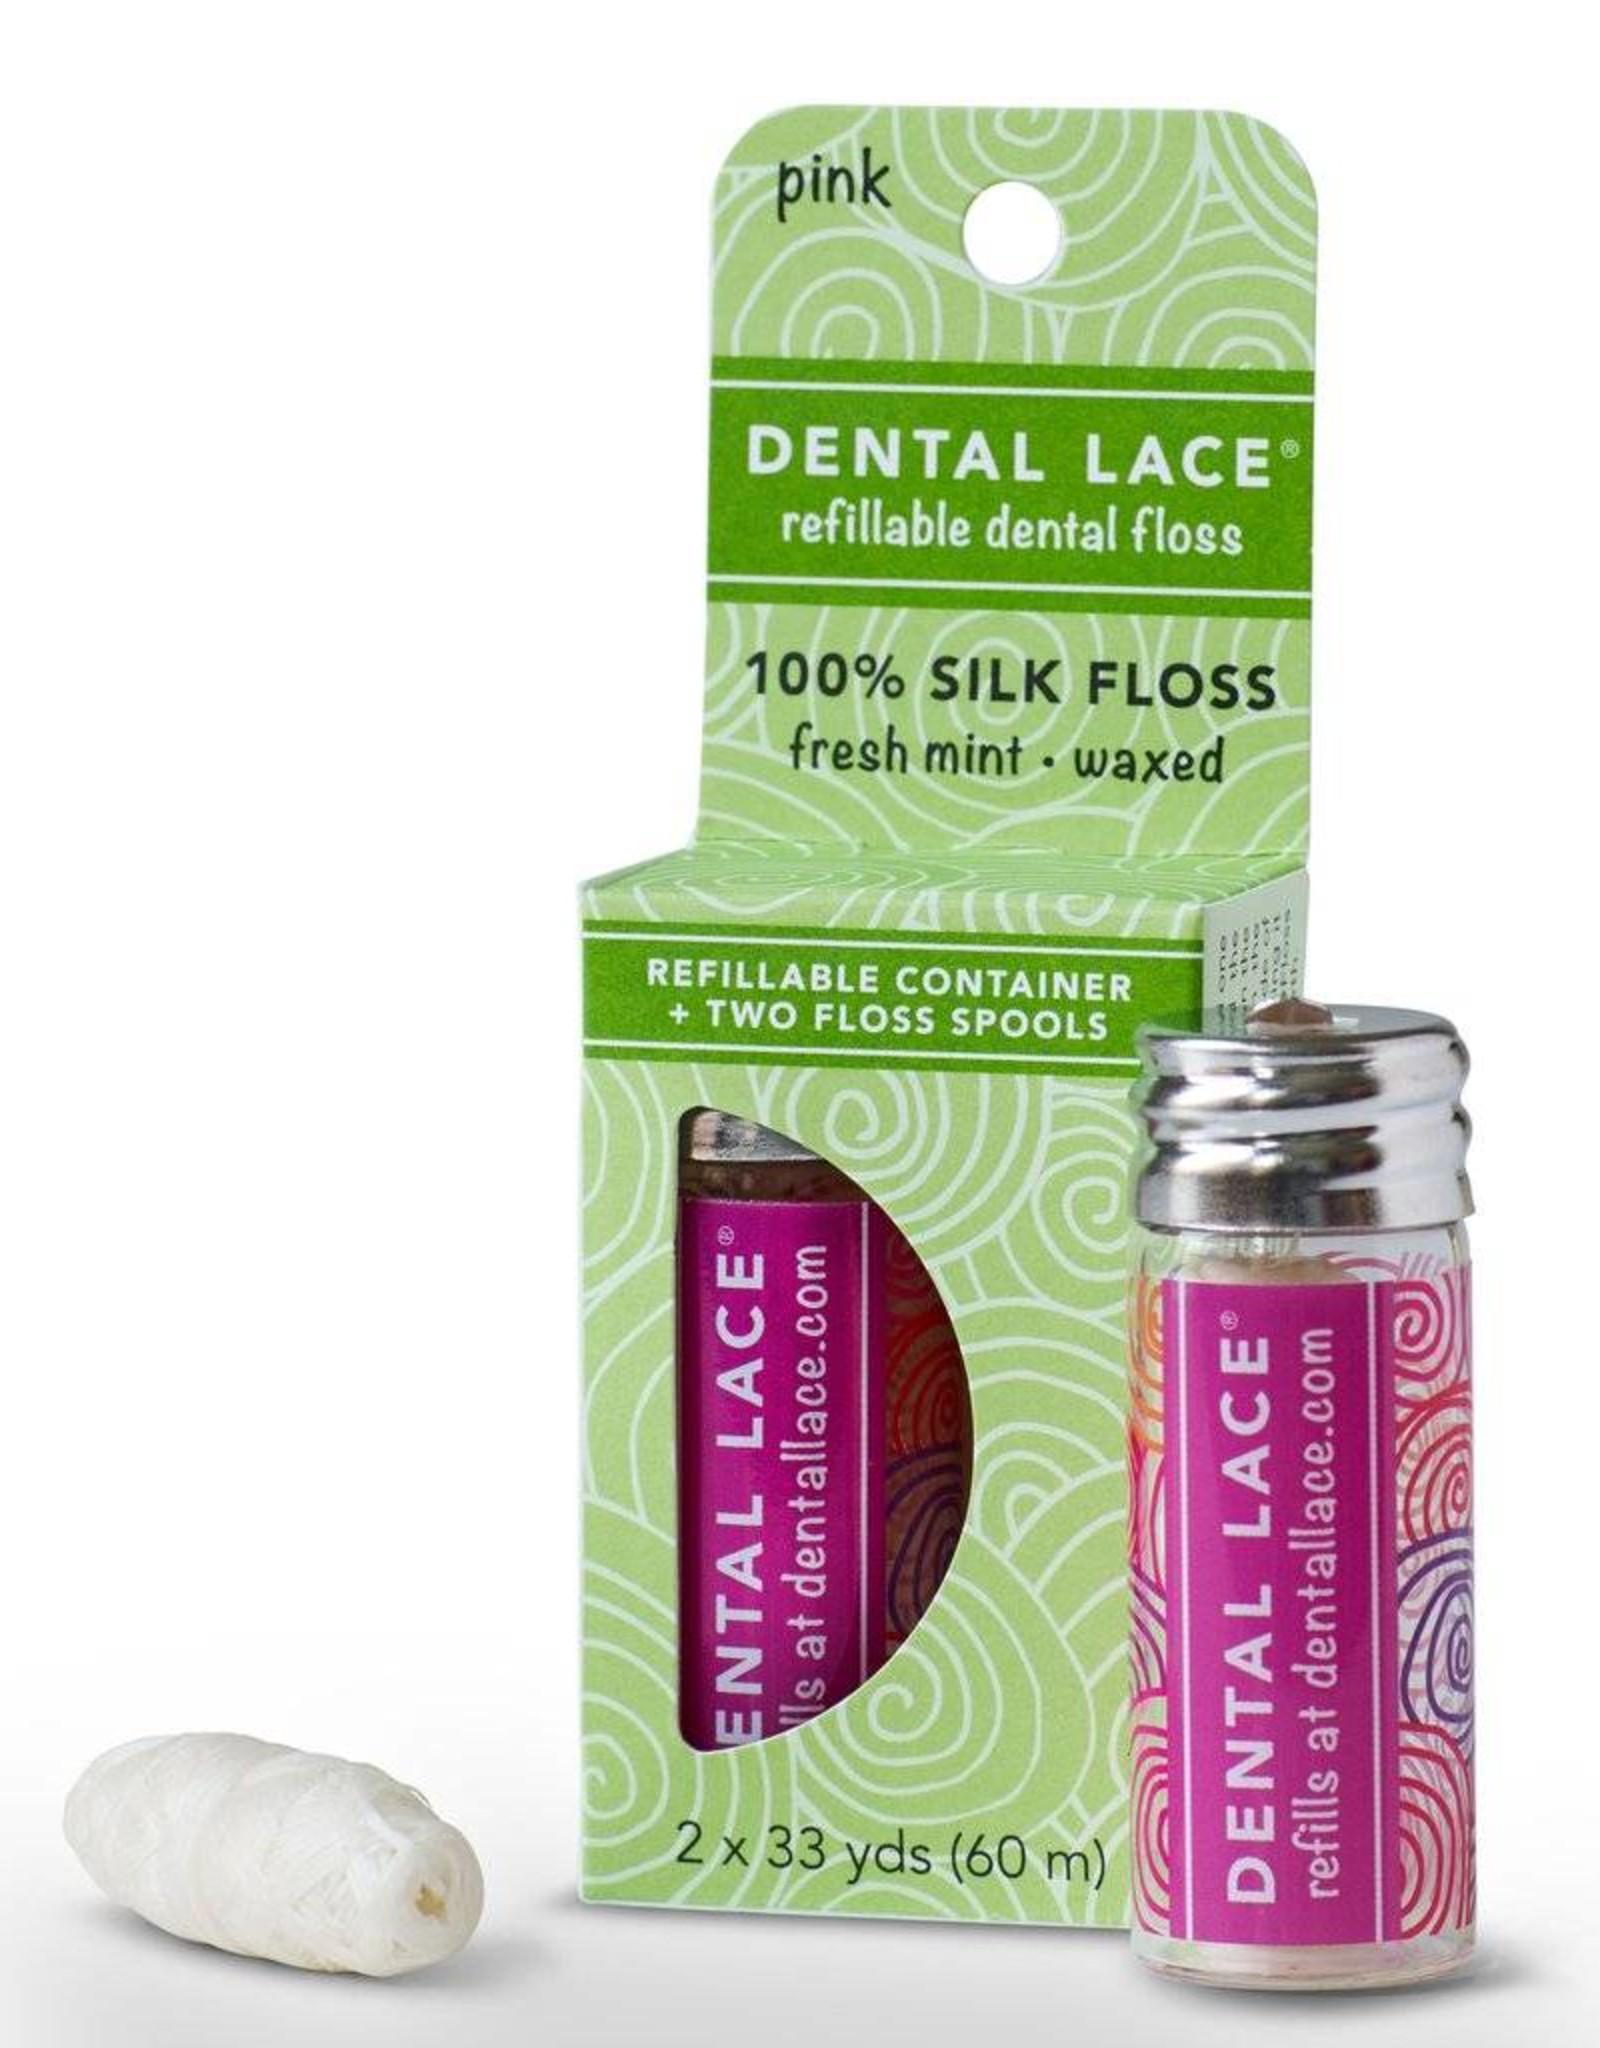 Dental Lace Dental Lace